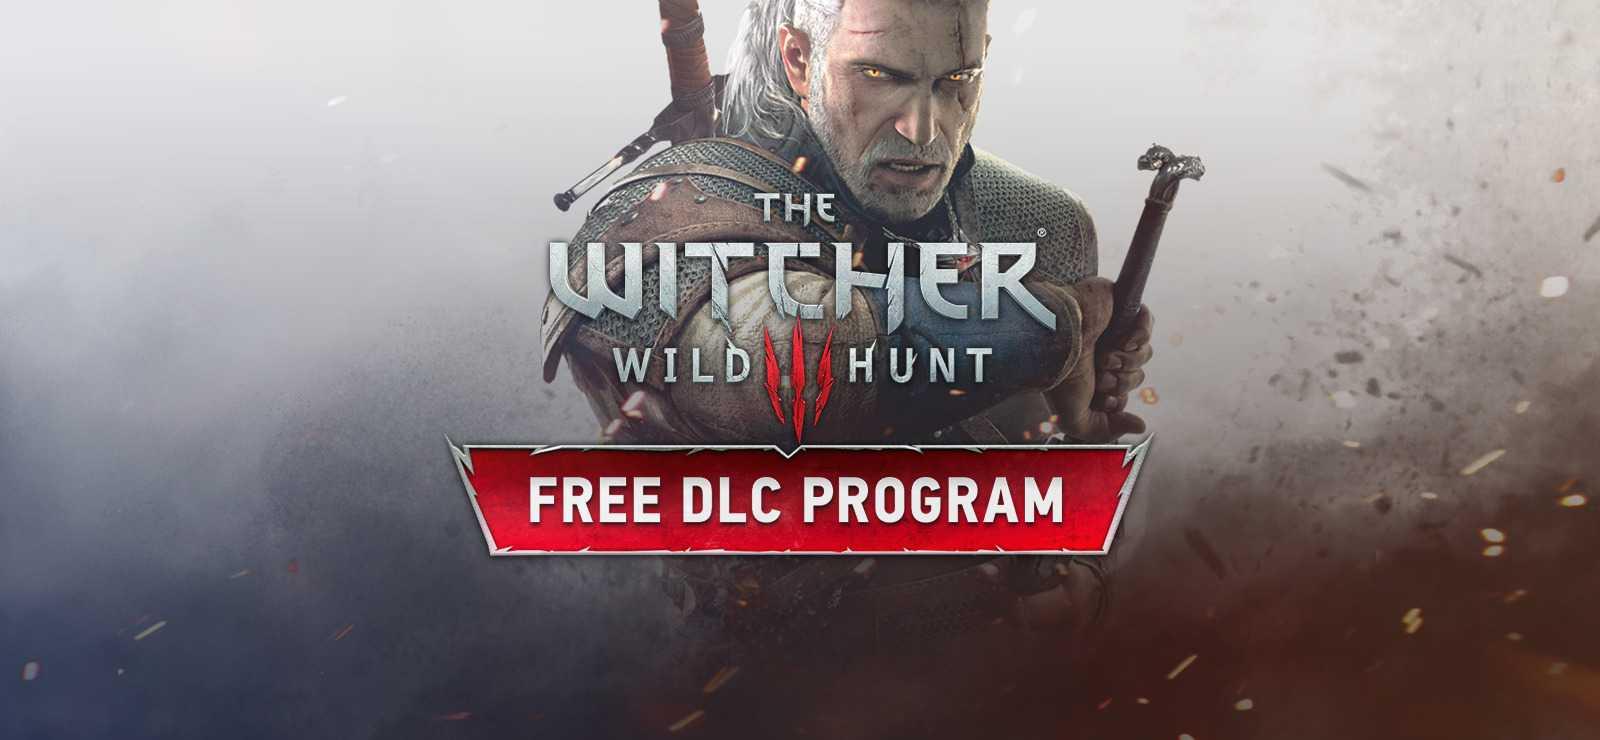 The Witcher 3: Wild Hunt - Free DLC Program